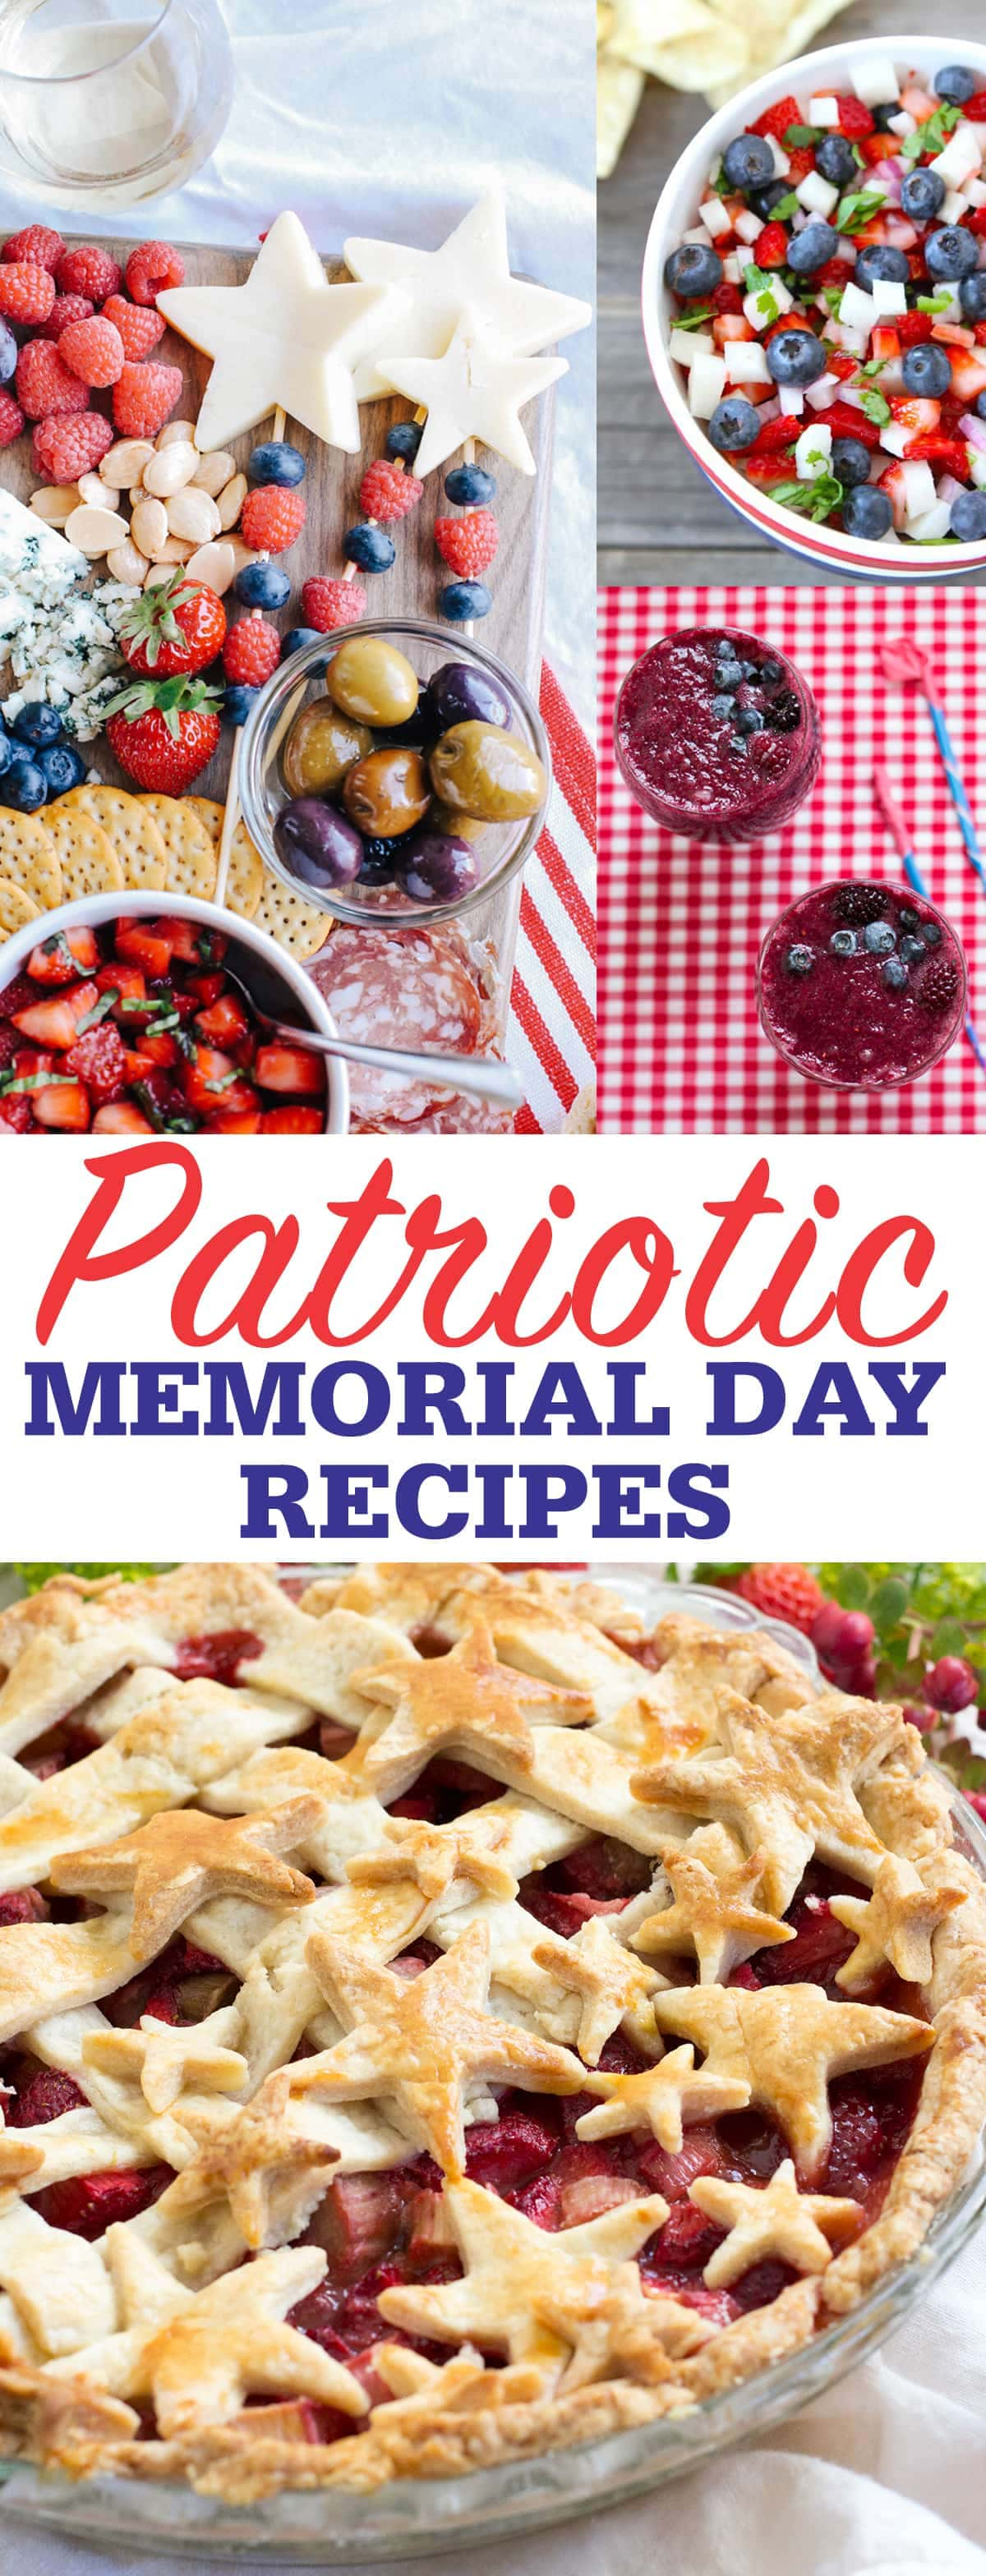 Patriotic Memorial Day Recipes